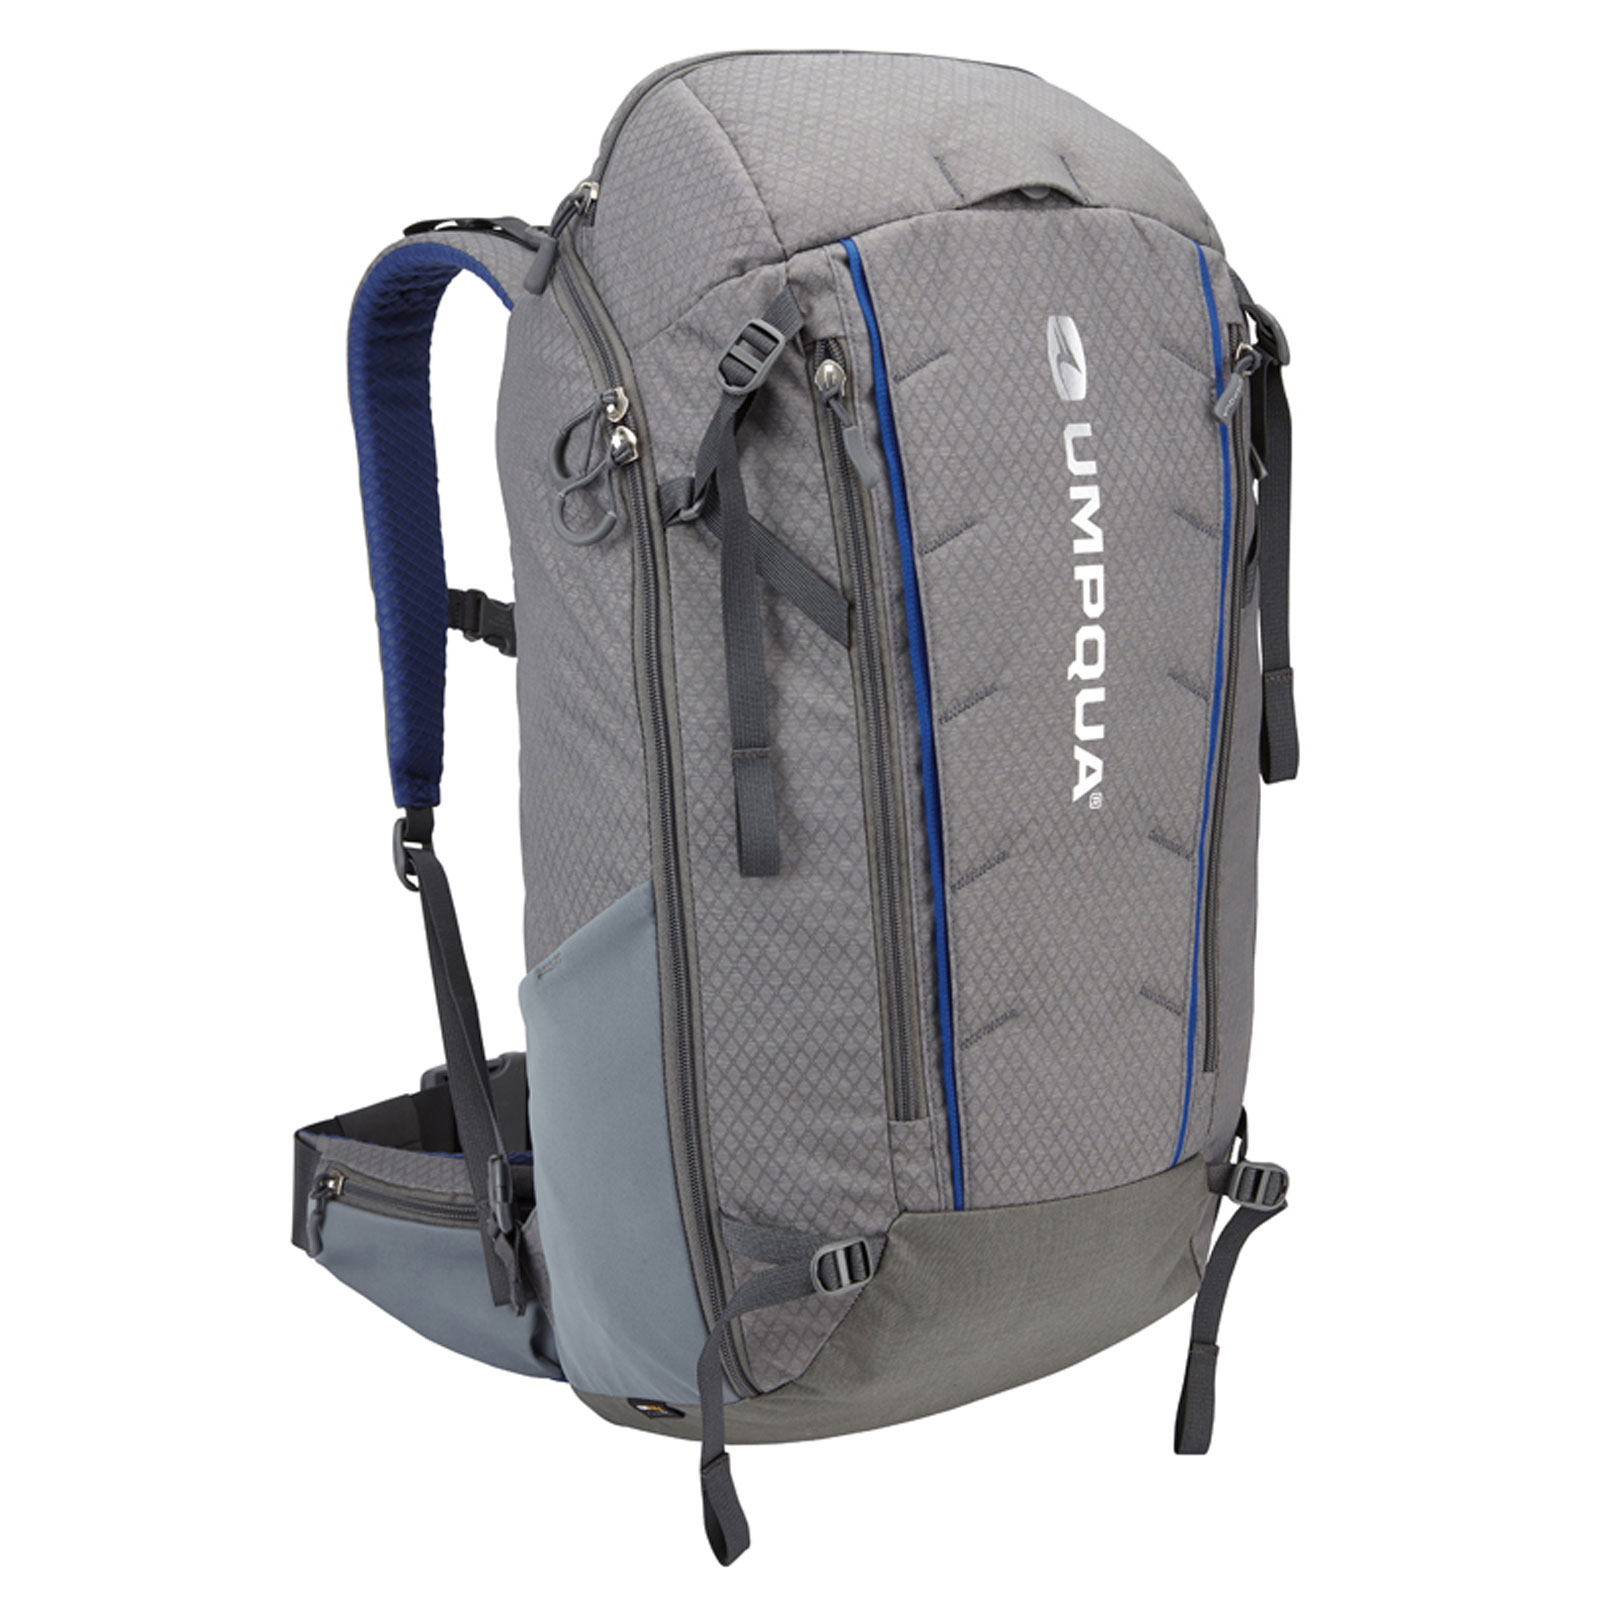 Umpqua surveyor 2000 zs zero sweep backpack fly fishing for Fishing backpack tackle bag